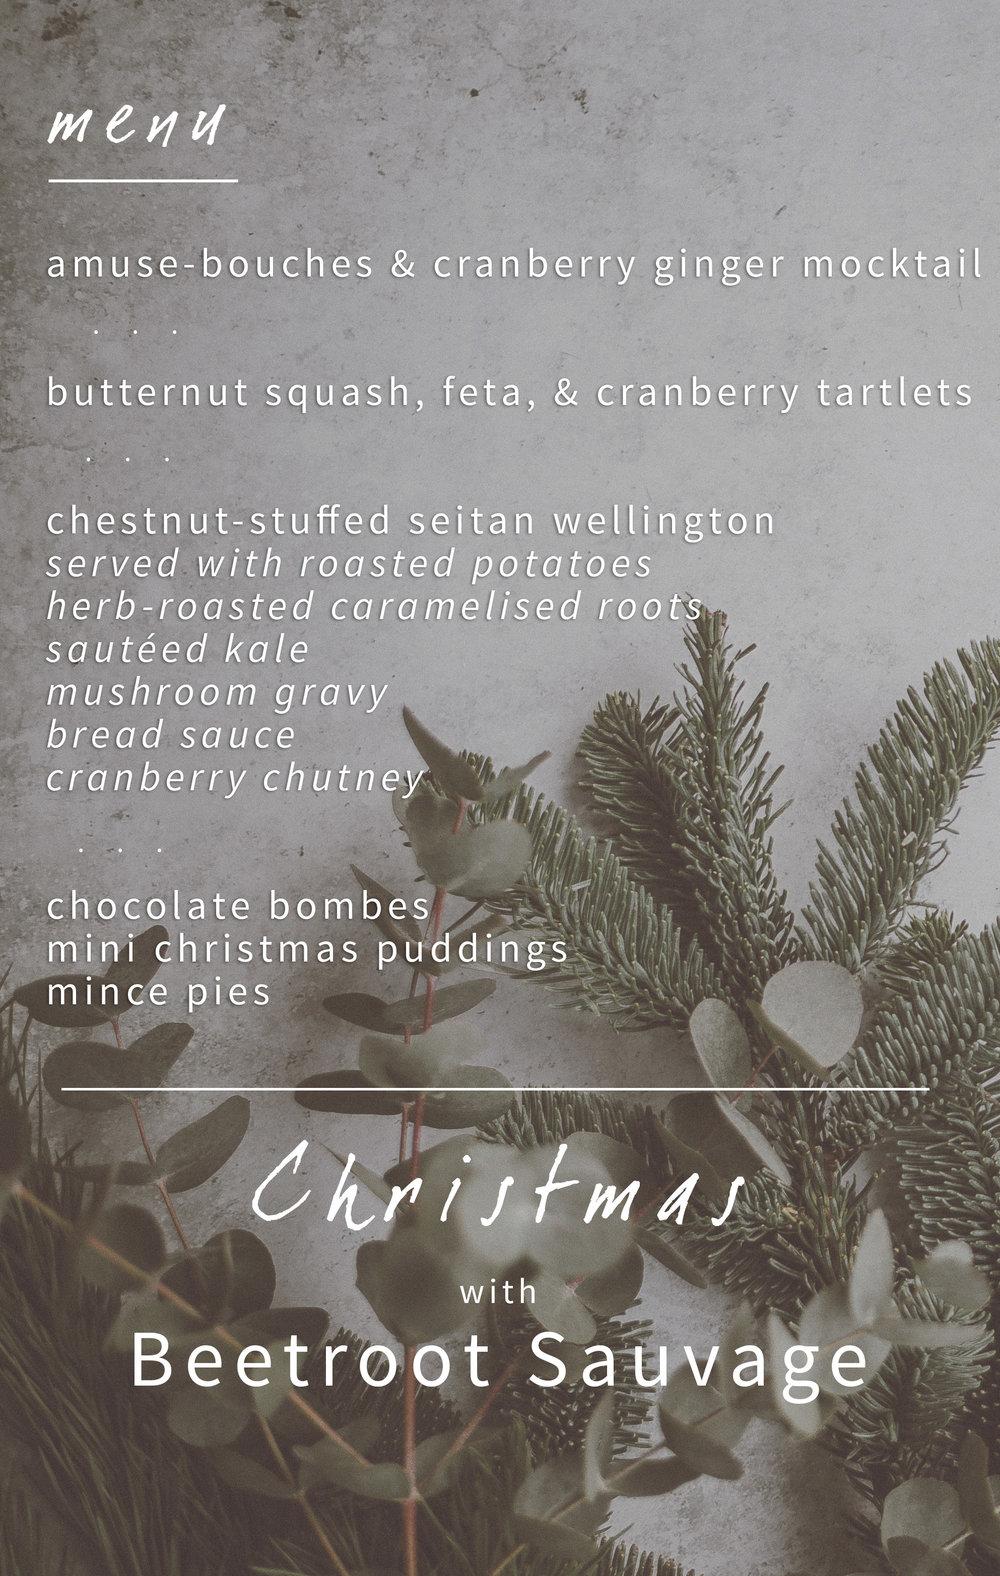 christmas_menu.jpg